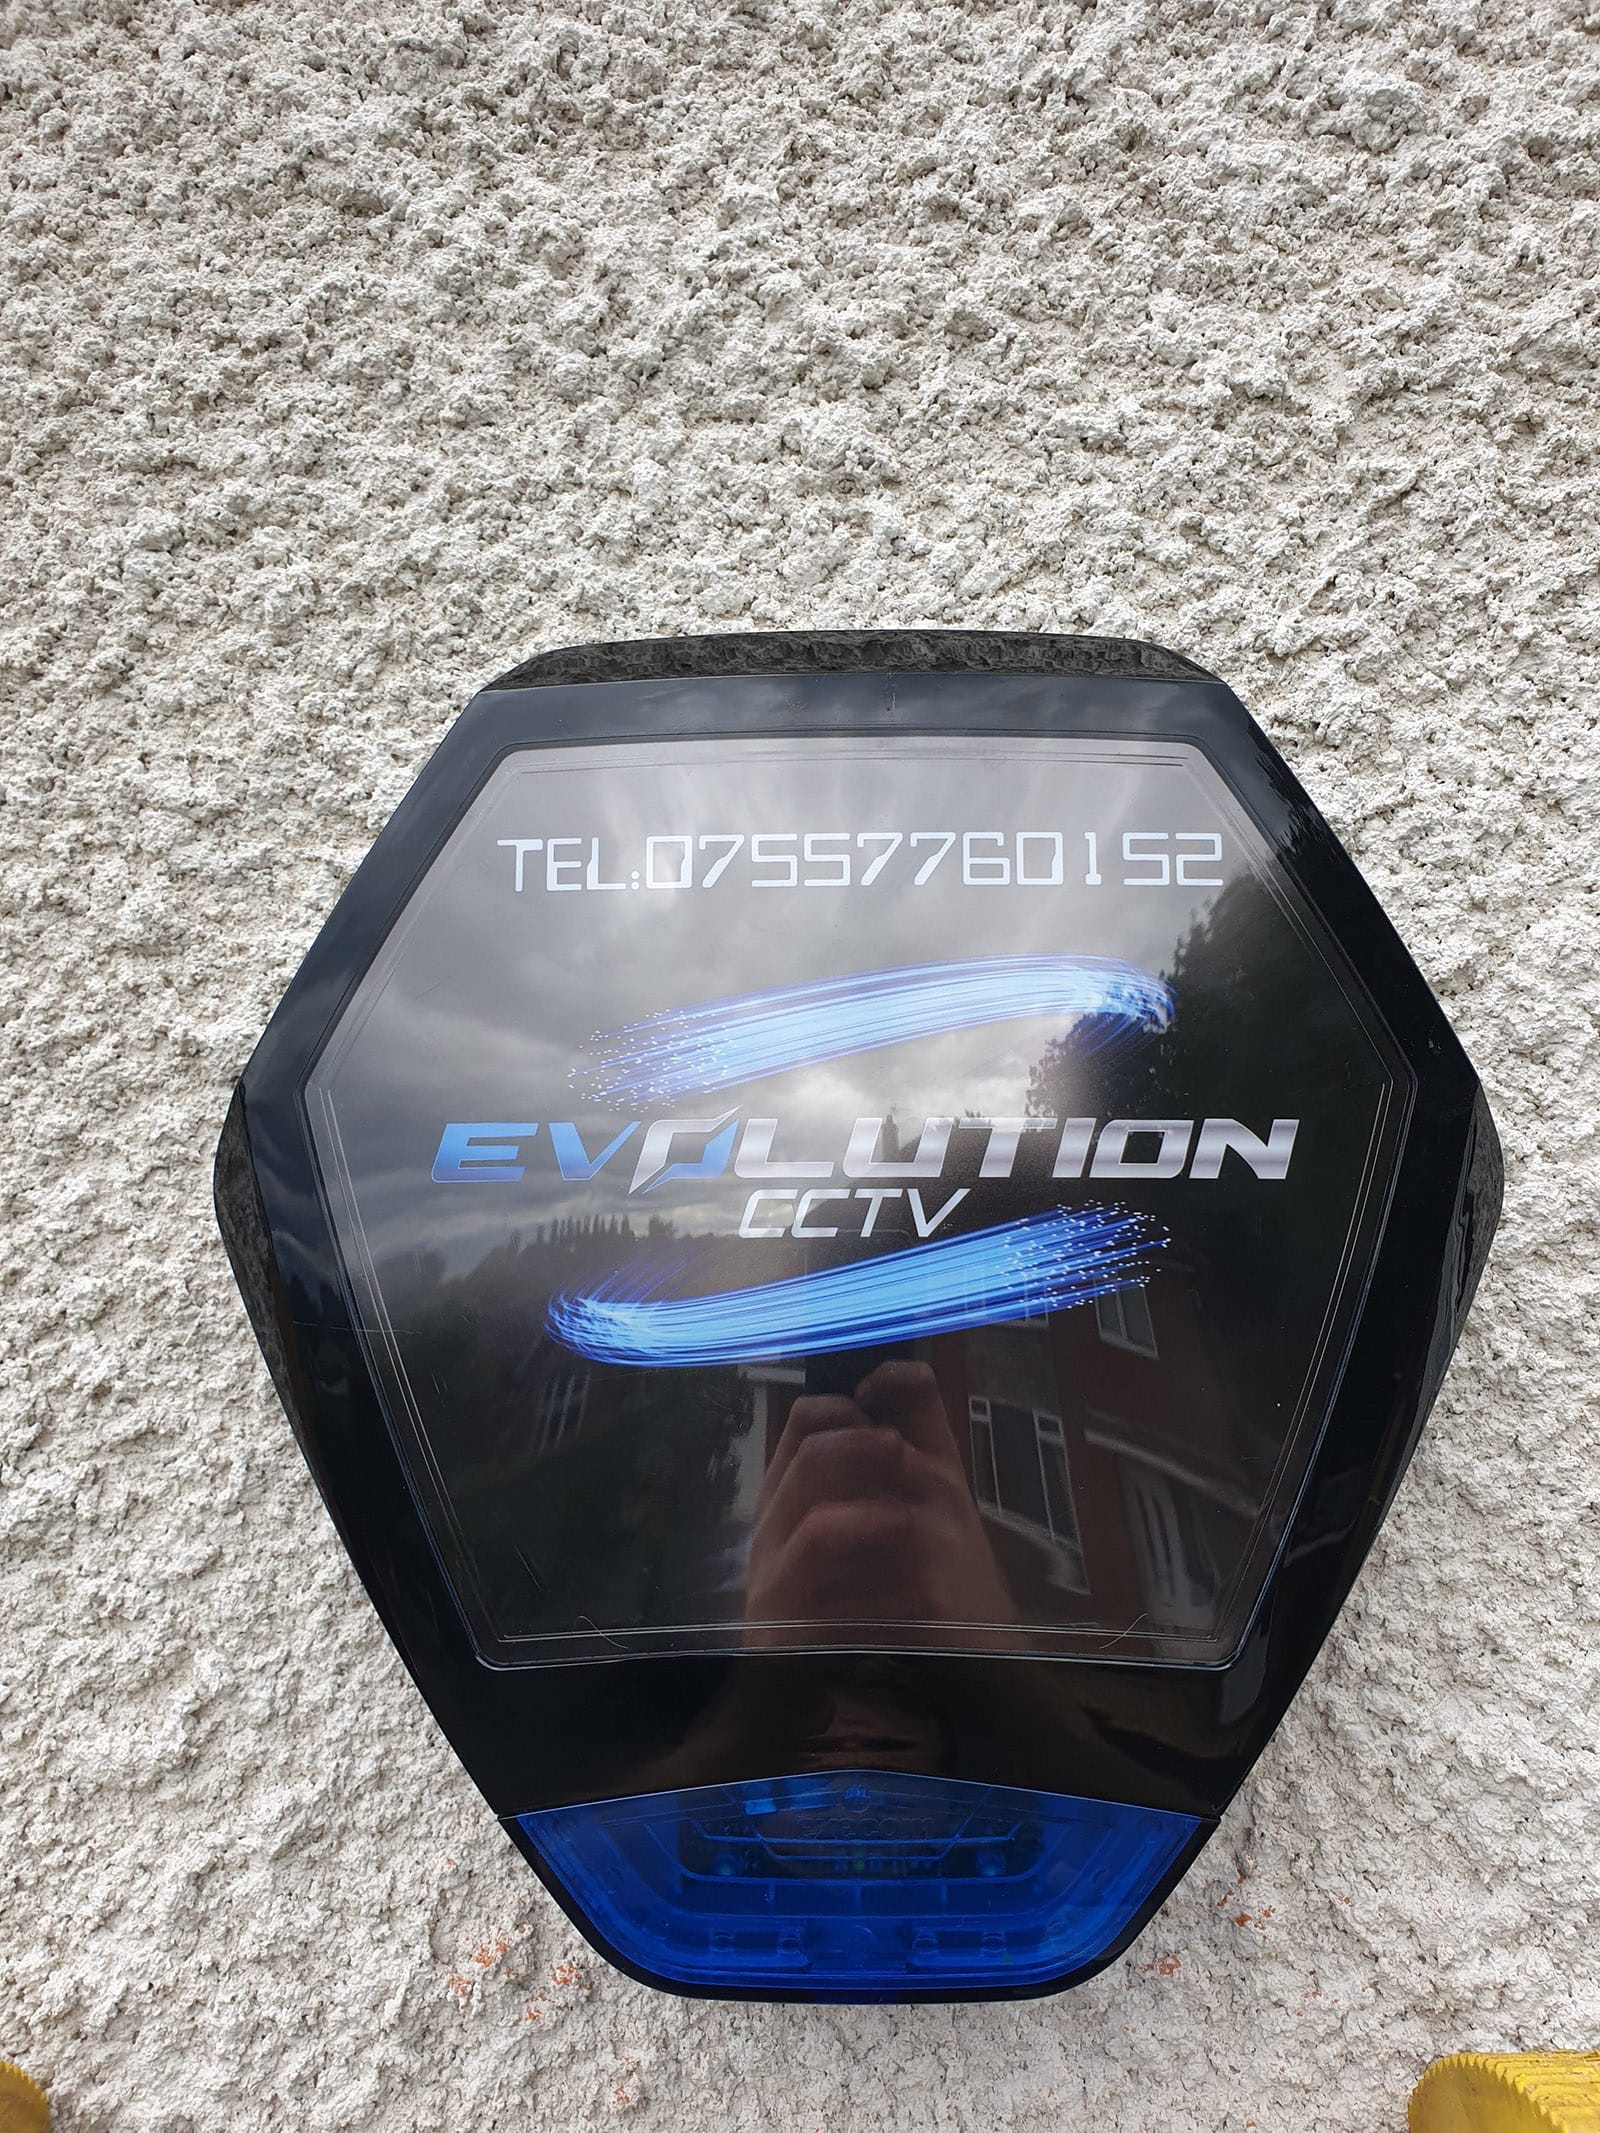 Evolution CCTV Alarm